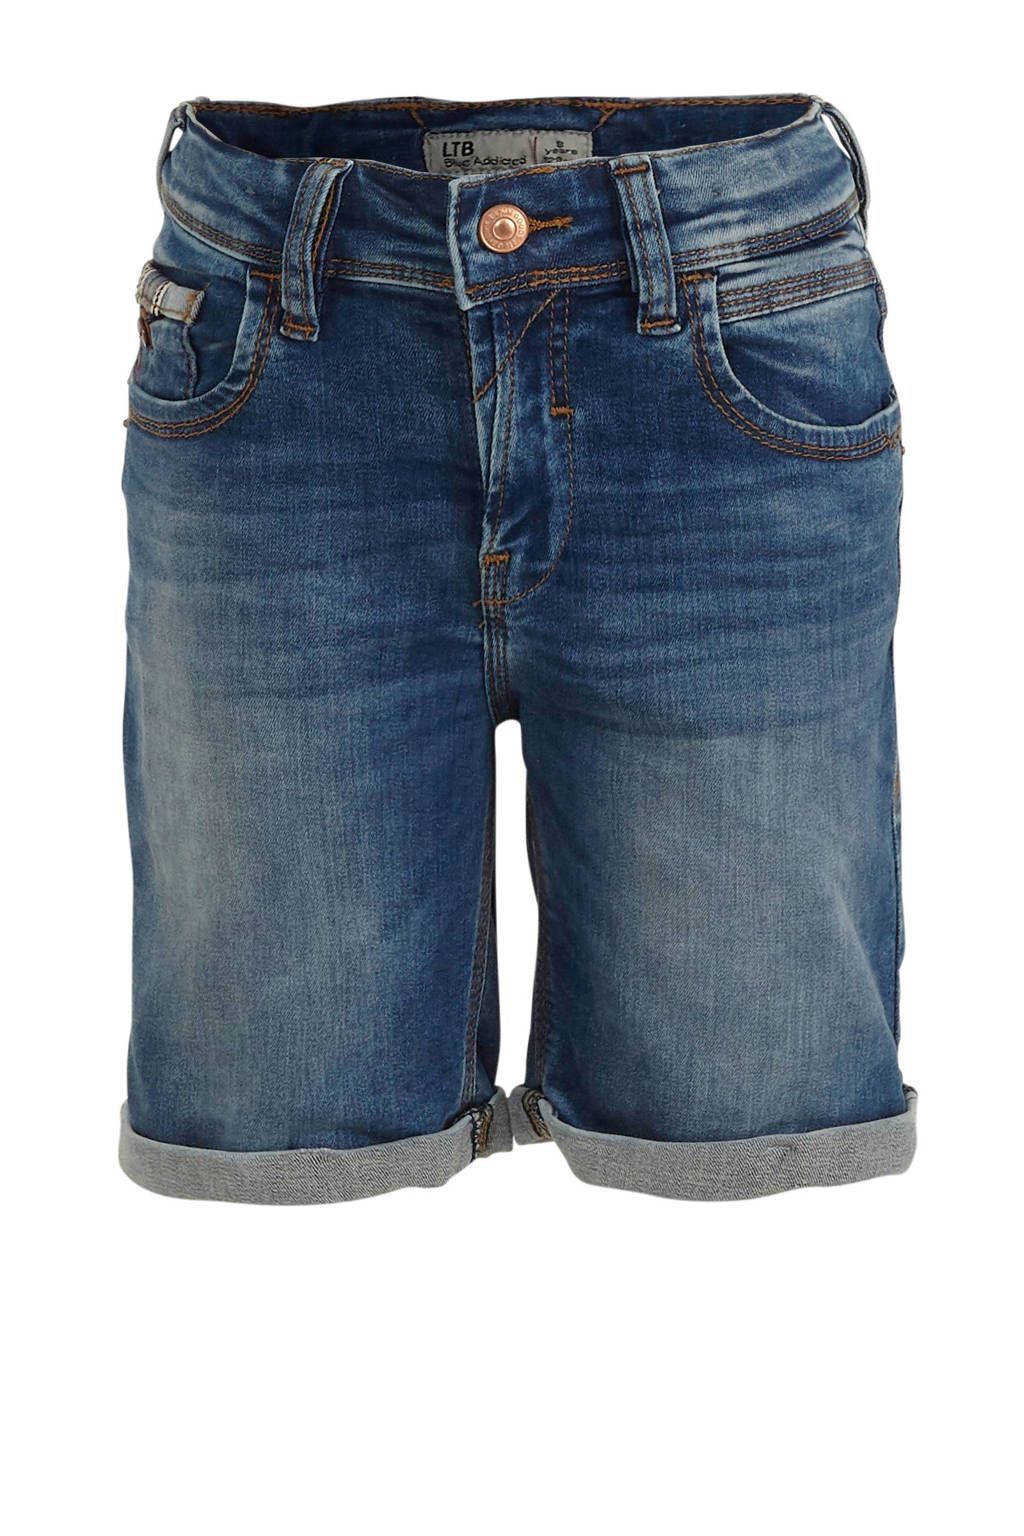 LTB slim fit jeans bermuda Lance ferlito x wash, Ferlito X wash